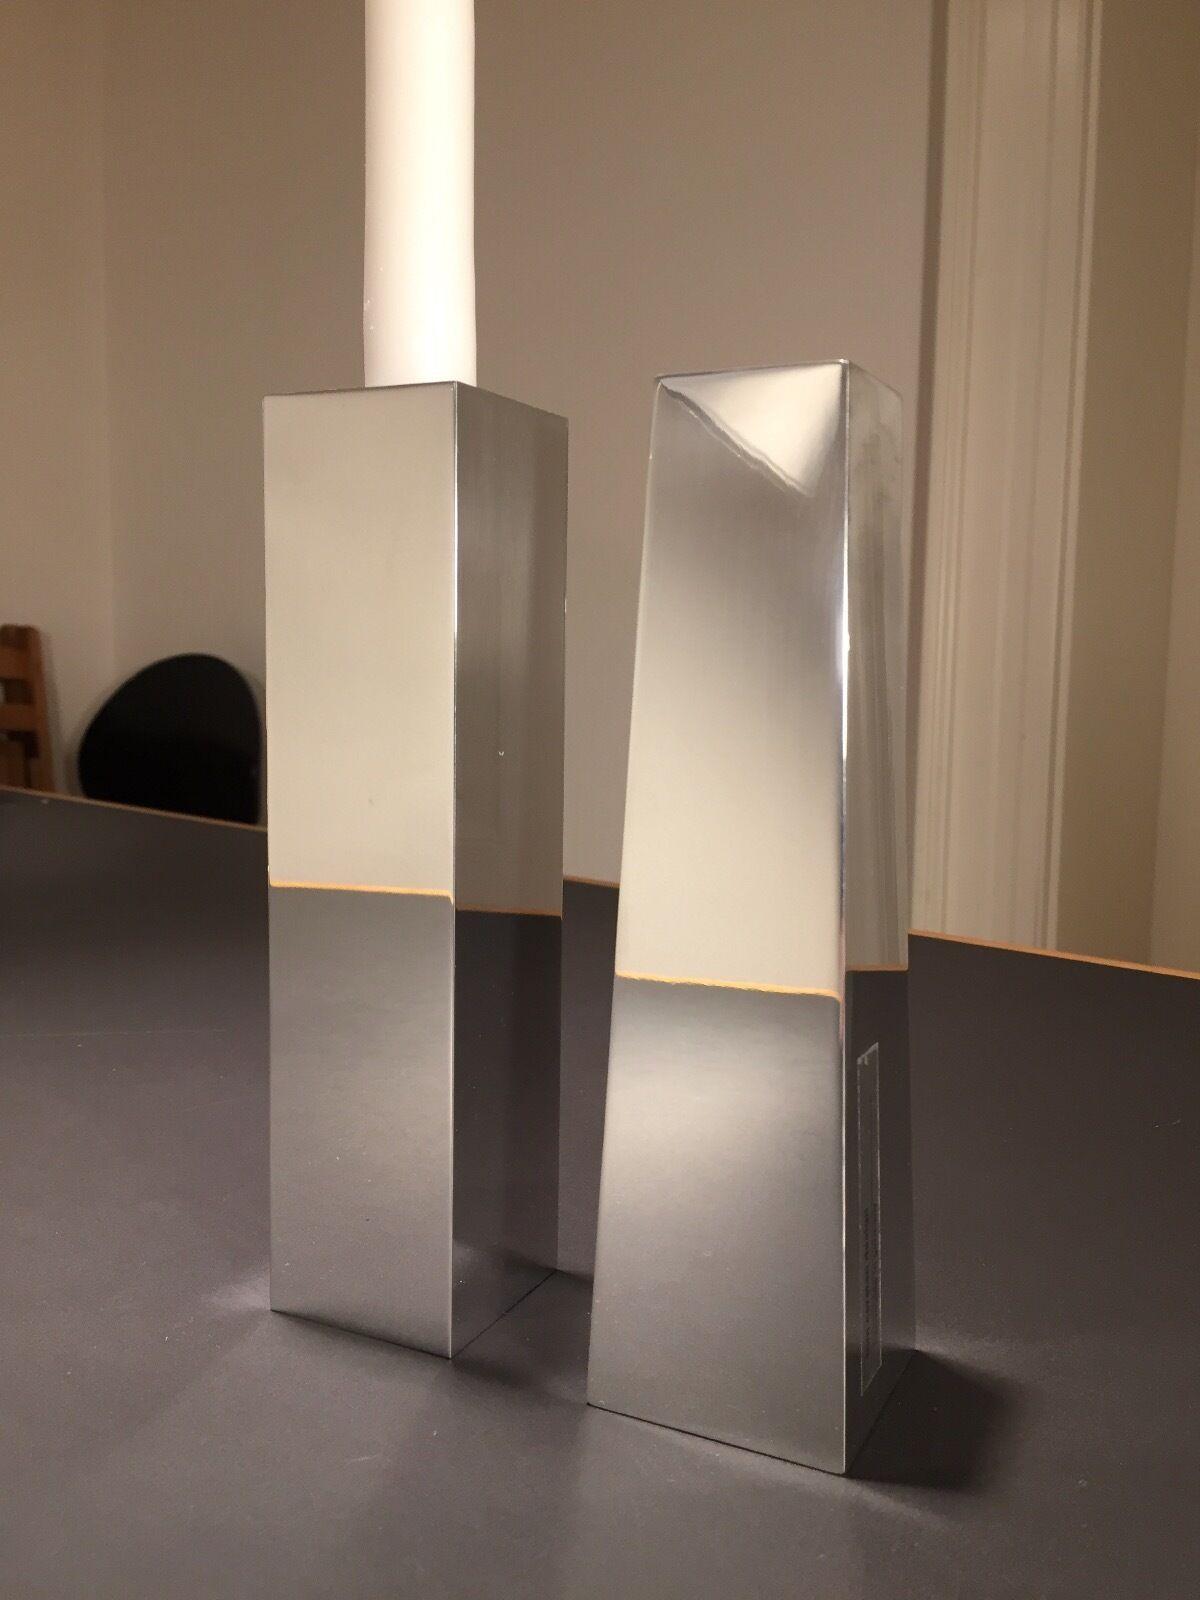 Edler Design Kerzenleuchter Kerzenständer  Piramidale  Größe C-groß Kerzenhalter